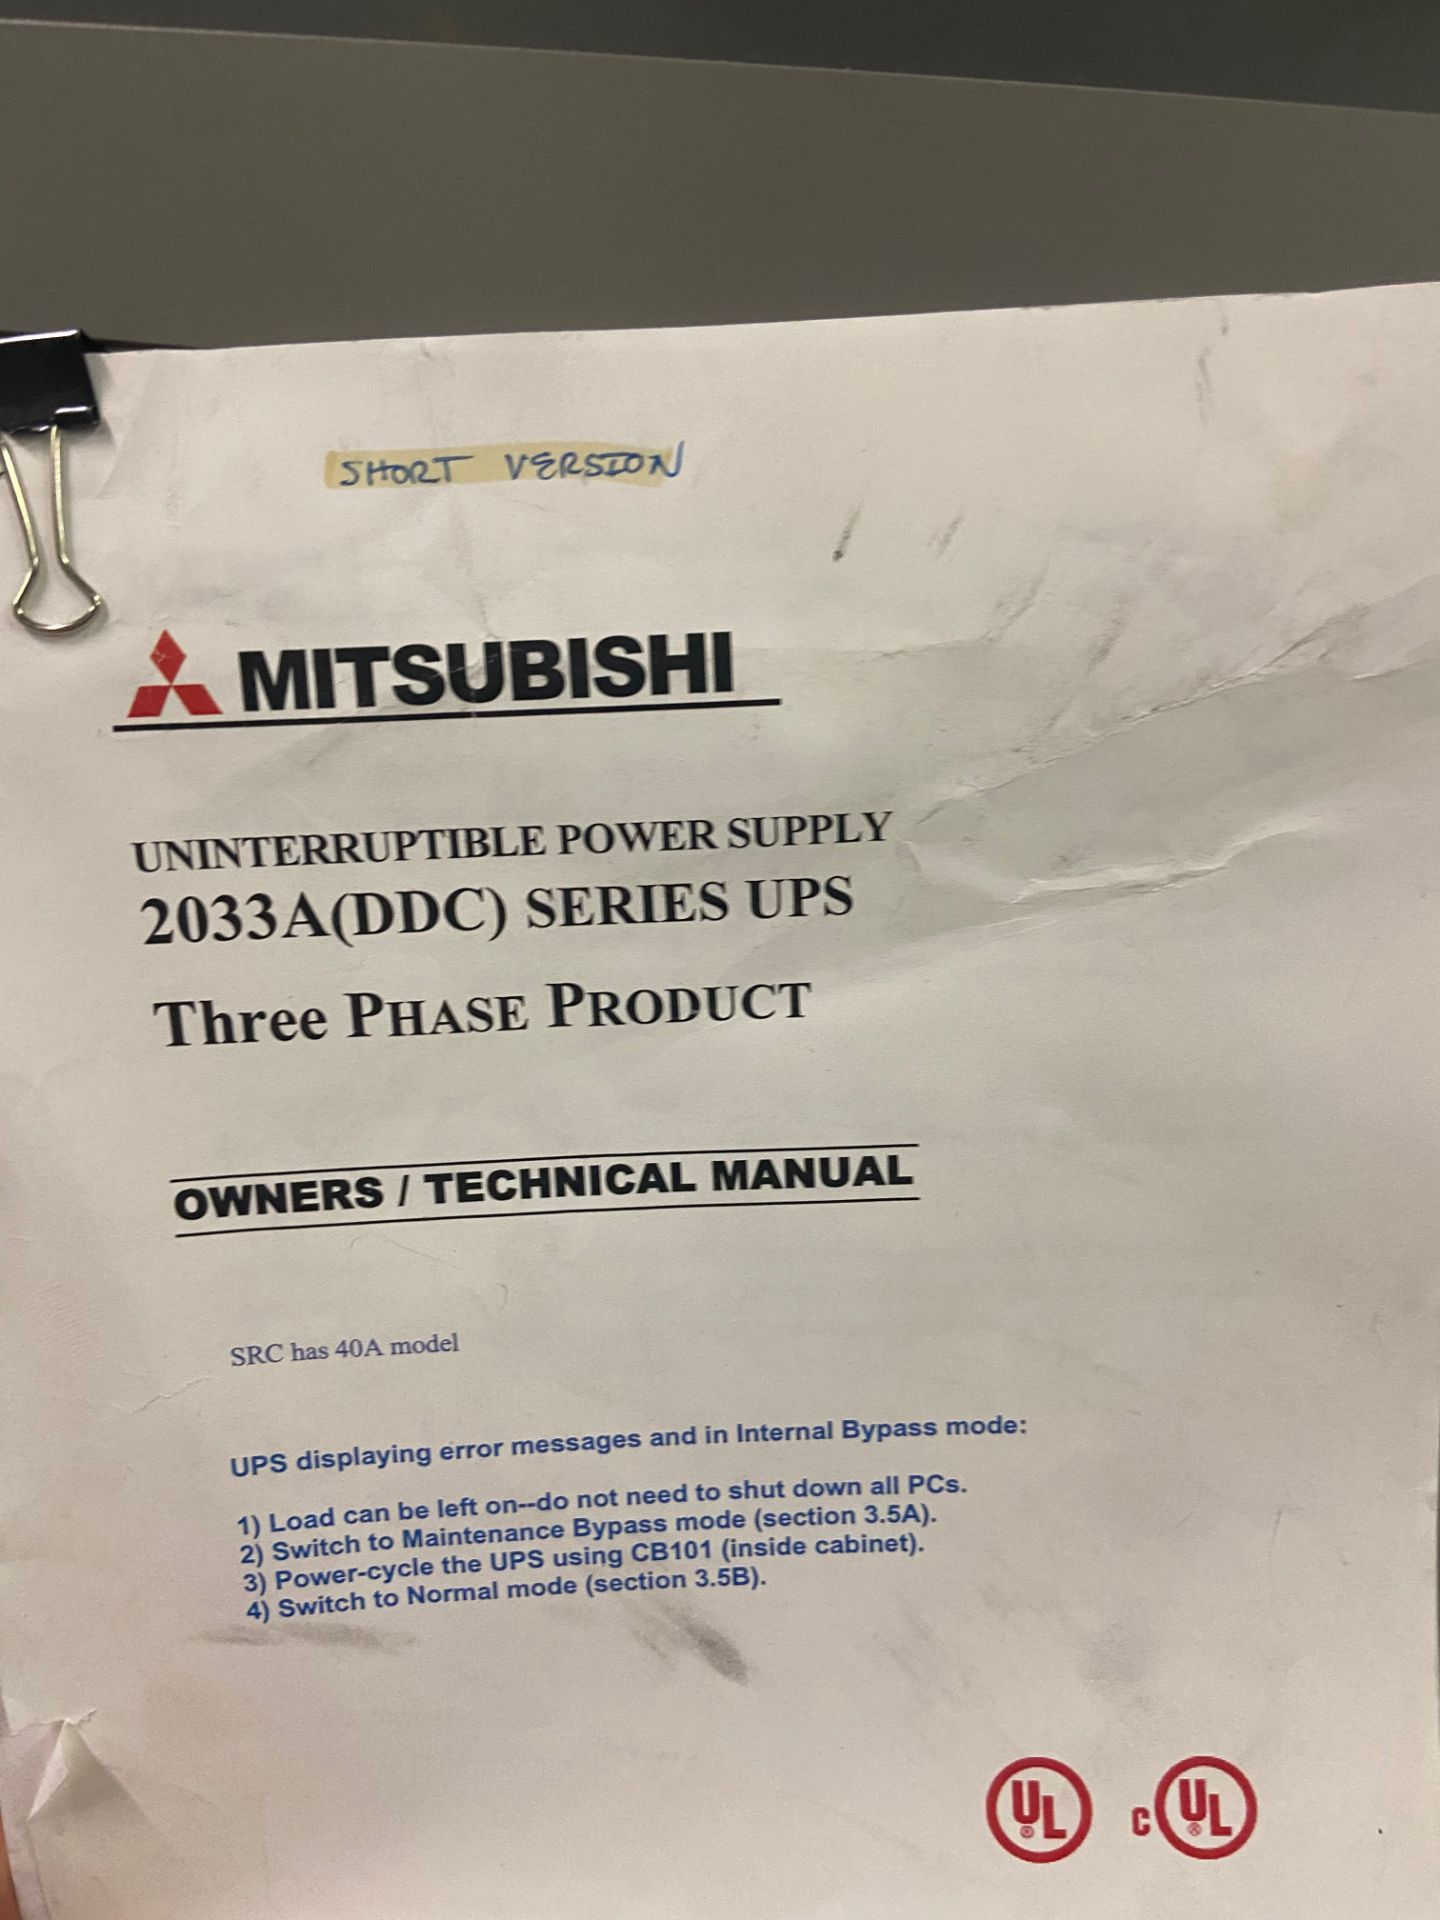 Mitsubishi Uninterruptible Power Supply, 2033A Series, Type UP2033A-B403SU-2, Serial# 96-GC8YQI-04, - Image 3 of 6